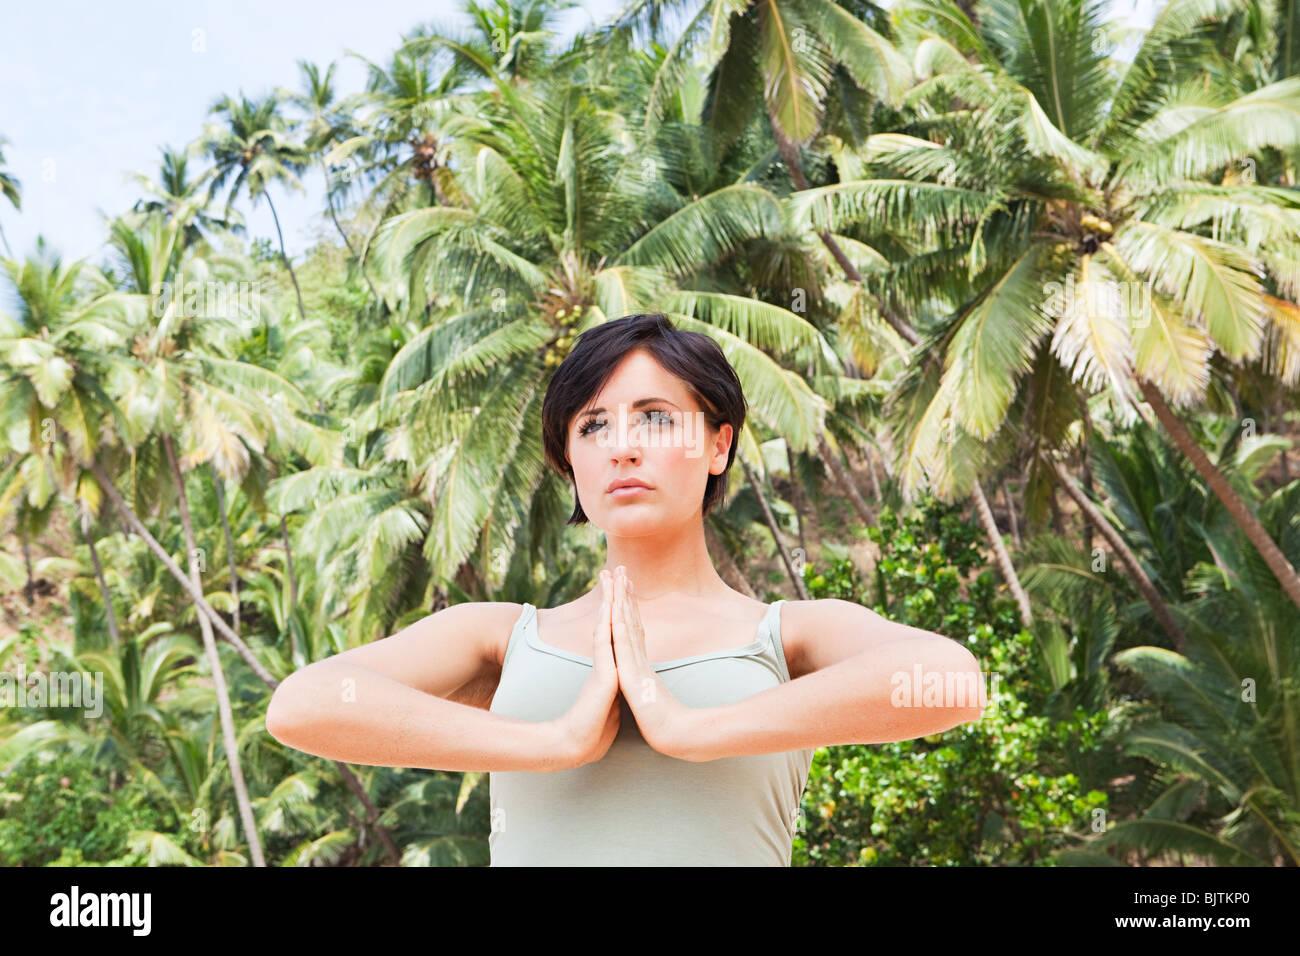 Woman in prayer pose - Stock Image